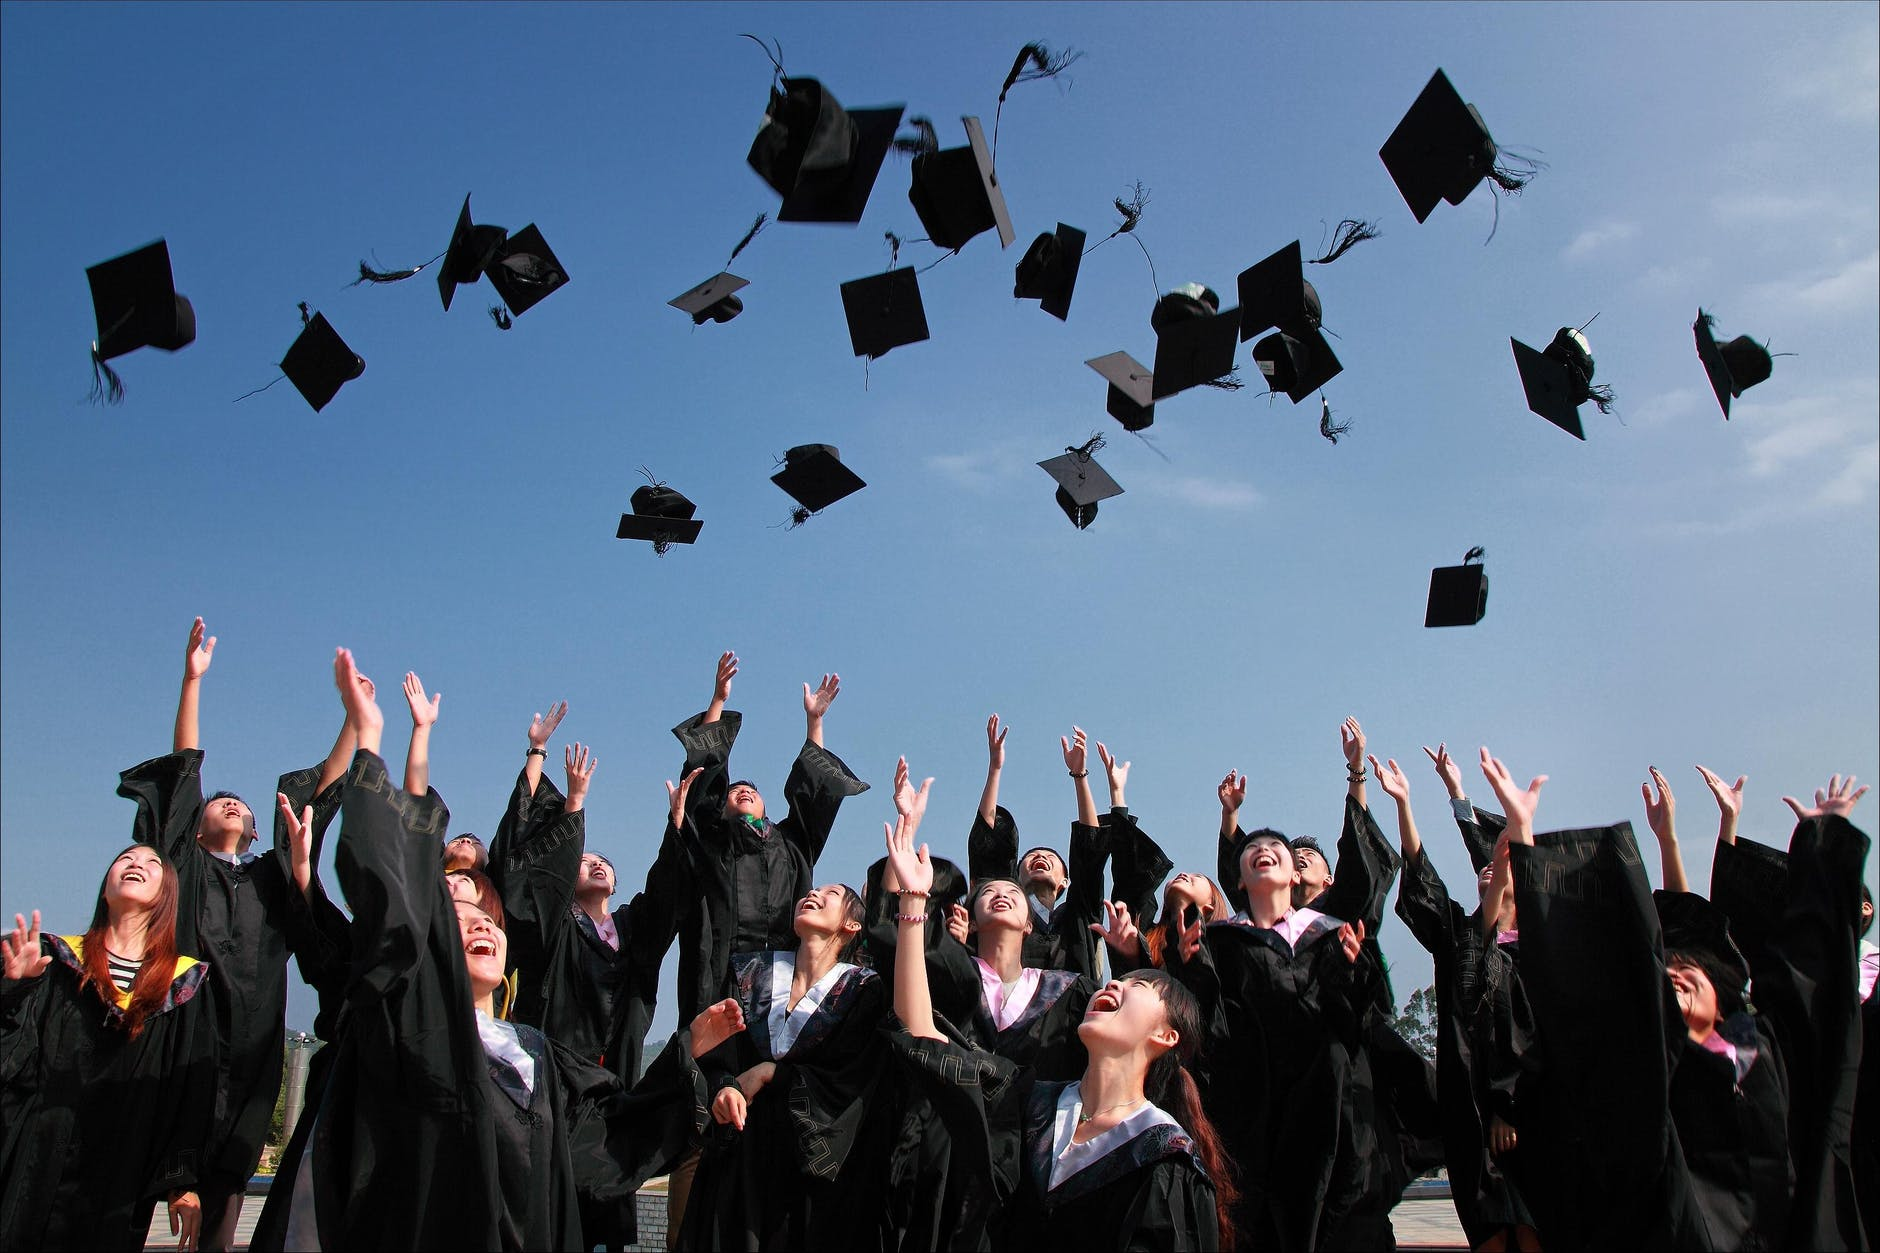 https://lisaslaw.co.uk/wp-content/uploads/2021/03/graduations.jpeg